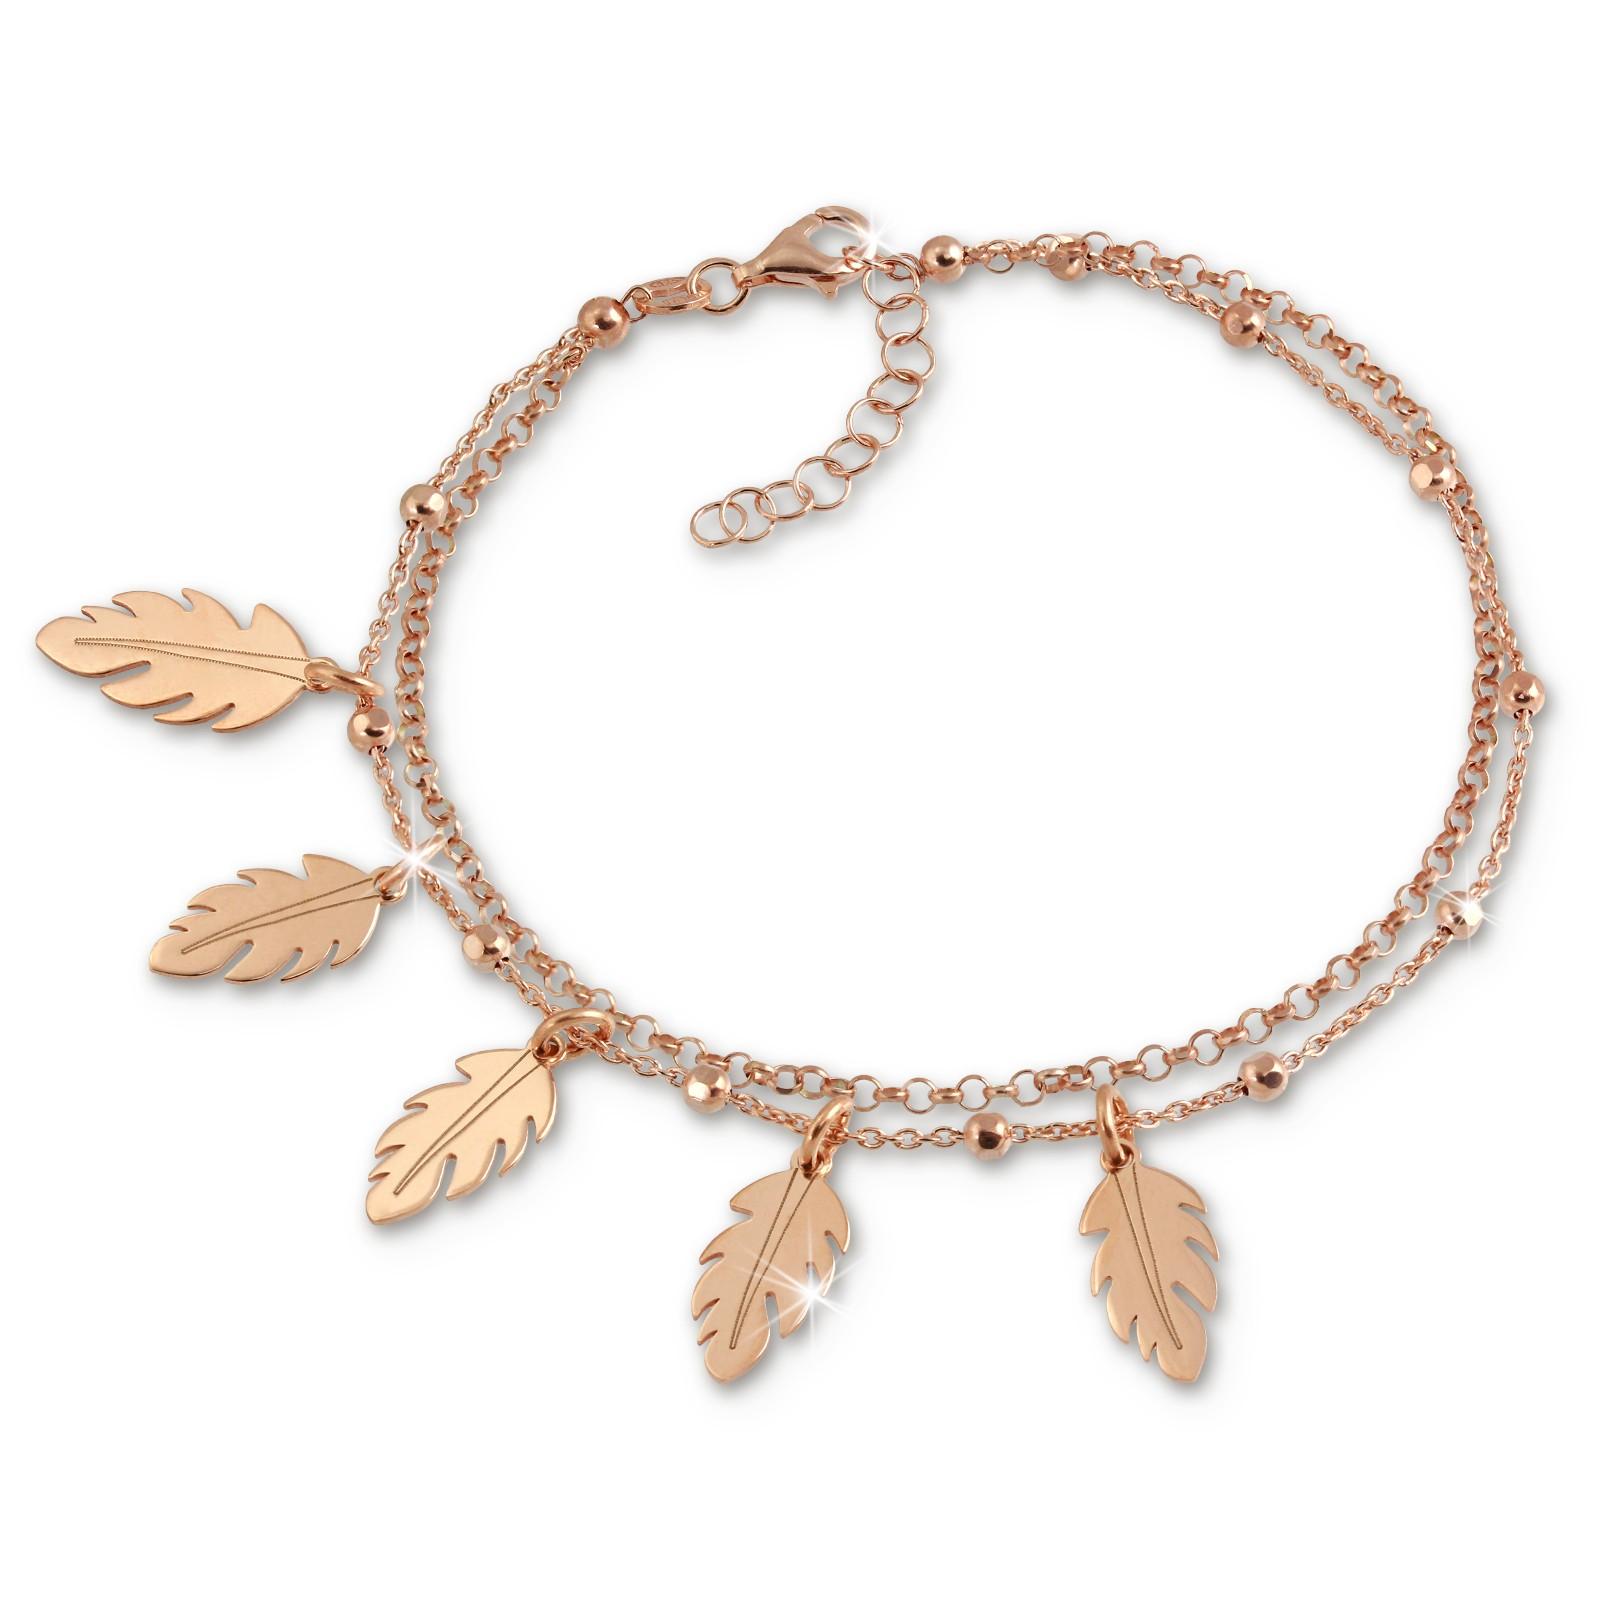 SilberDream Doppel-Armband Blätter 925 Silber rosévergoldet Damen 18cm SDA1158E